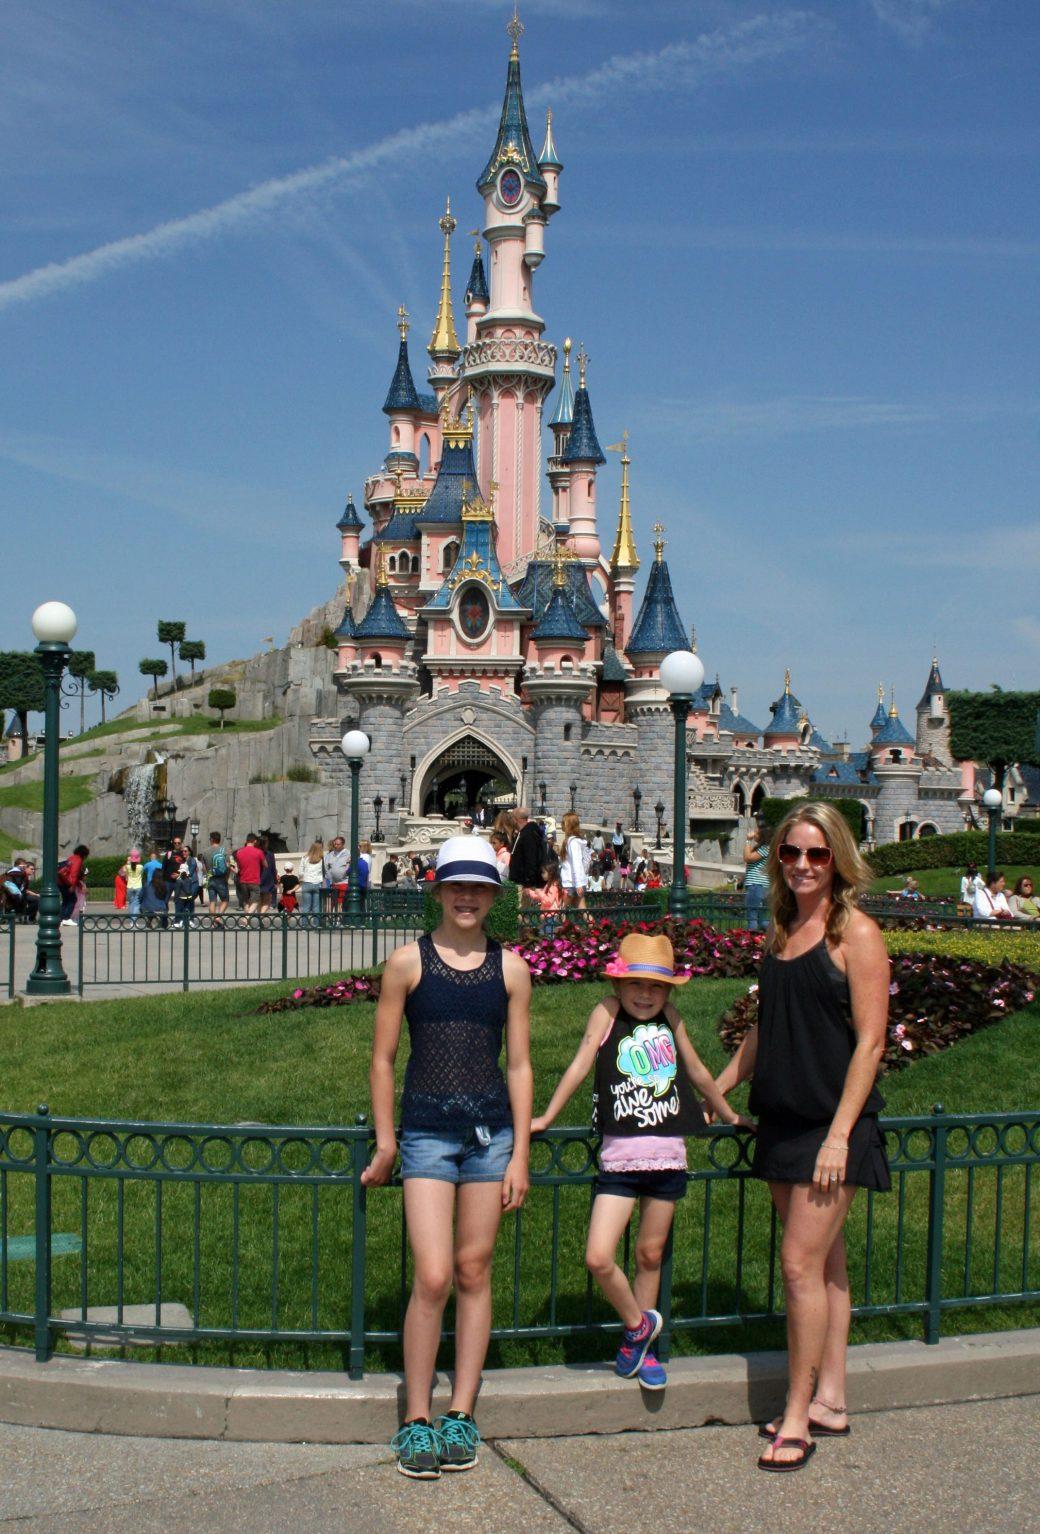 Sleeping Beauty Castle, Disney Paris